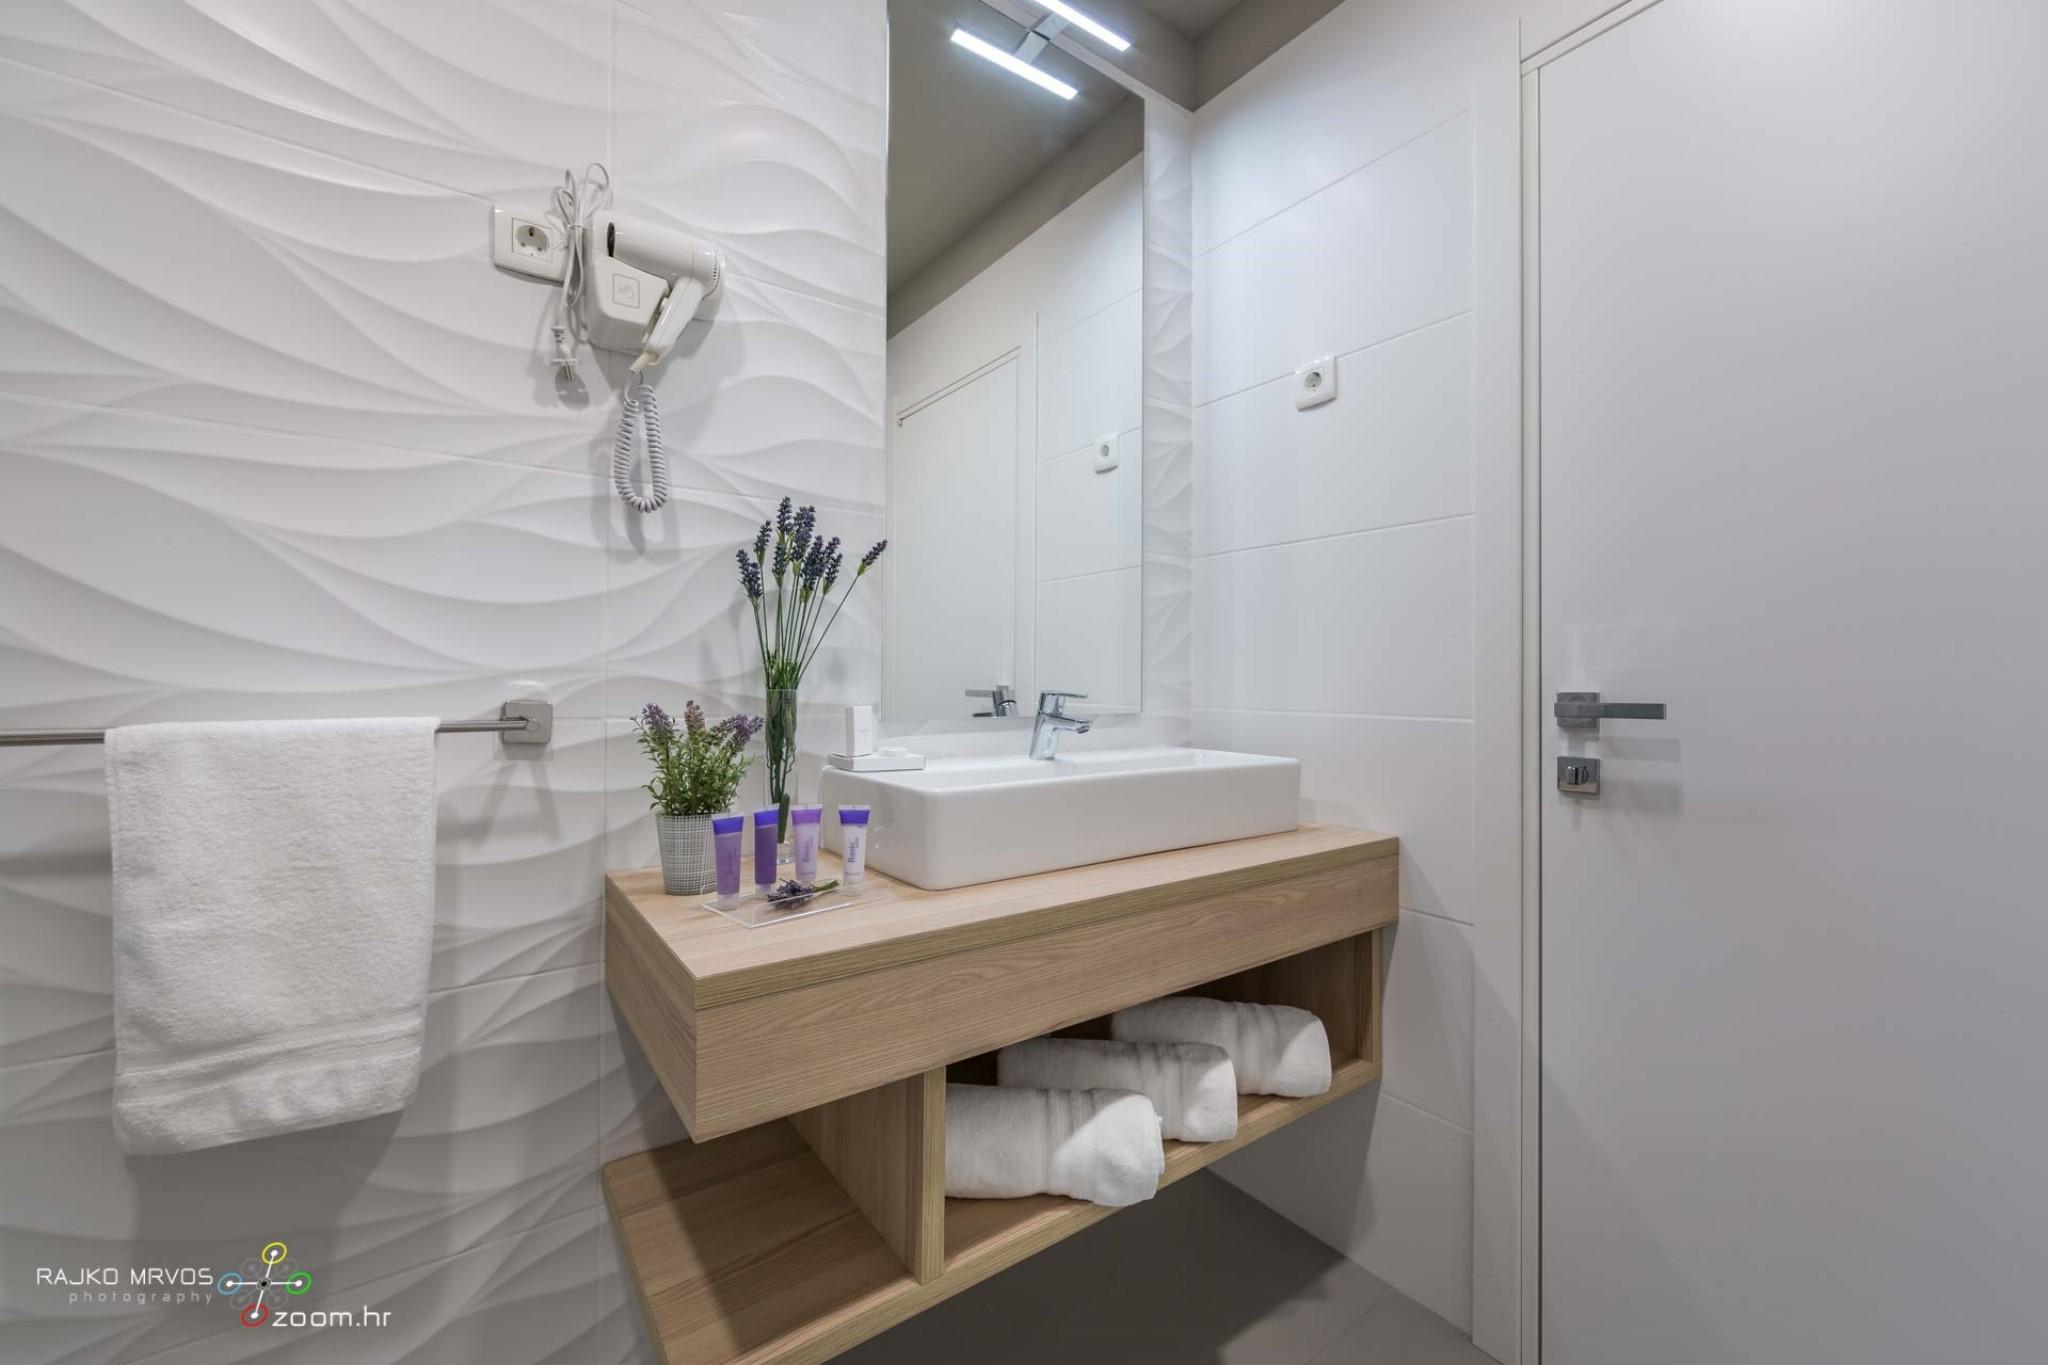 fotografiranje-interijera-fotograf-eksterijera-apartmana-vila-kuca-apartman-Preelook-27